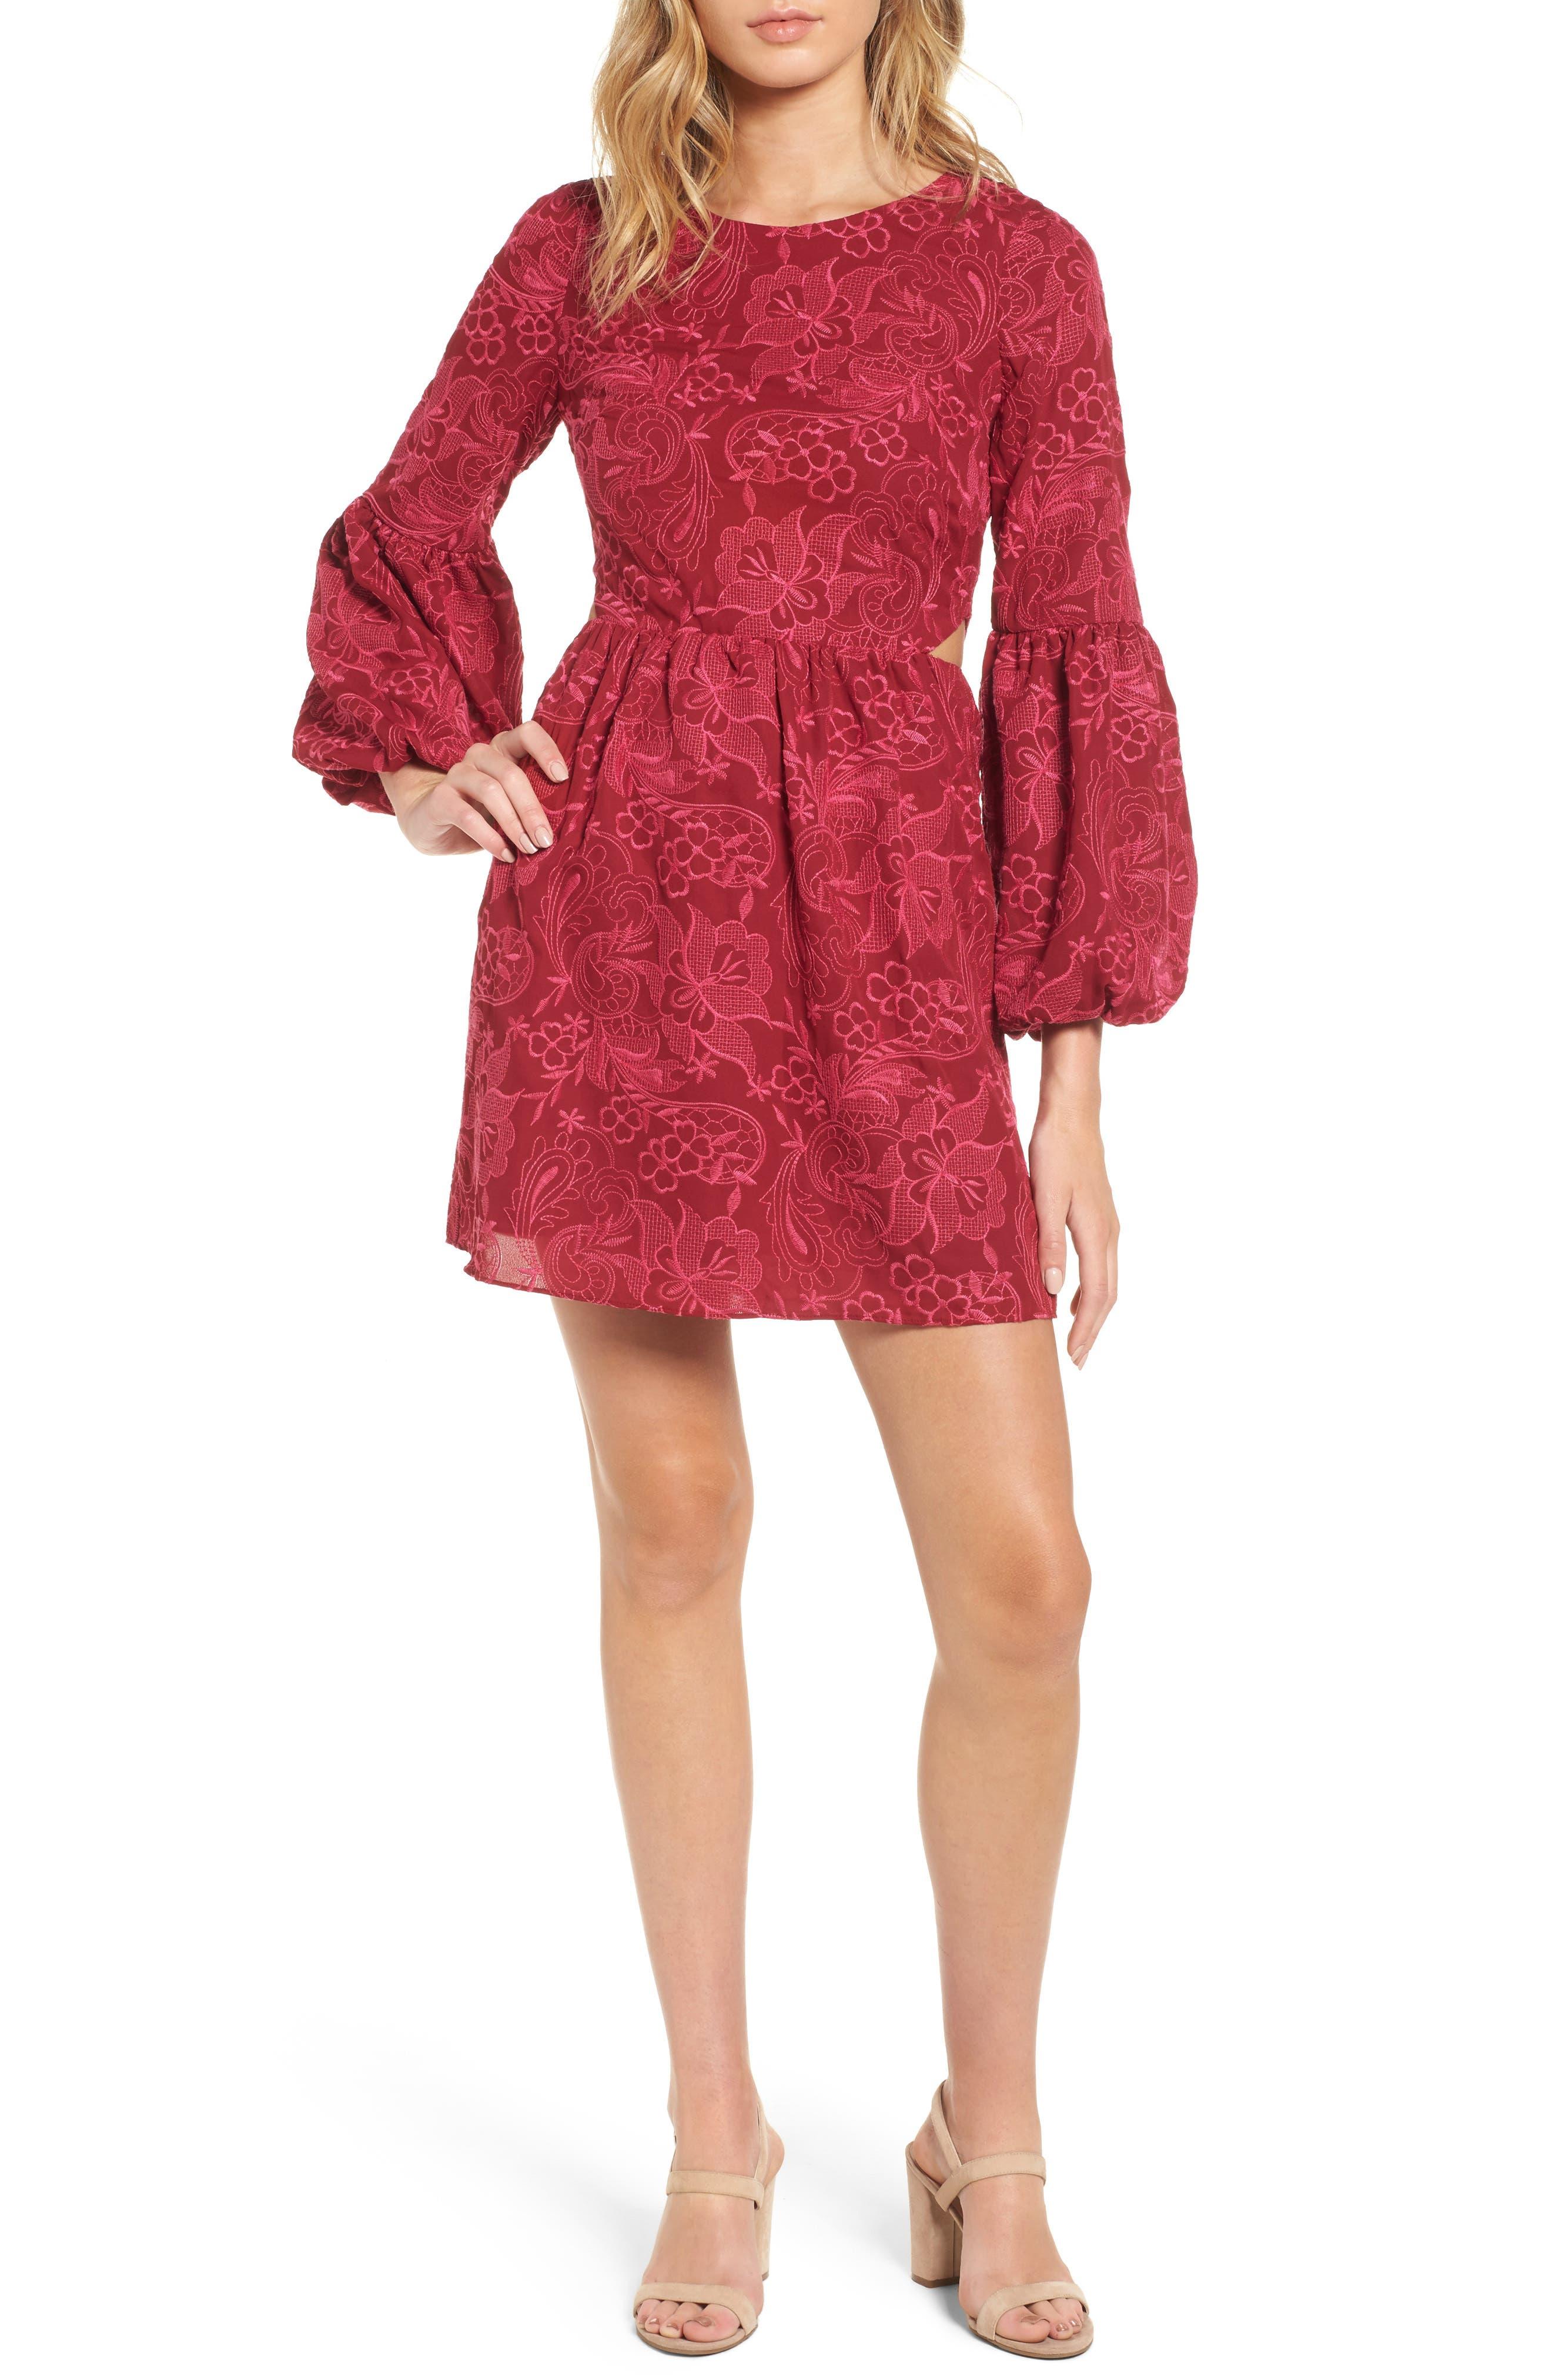 devlin Serafina Bell Sleeve Dress